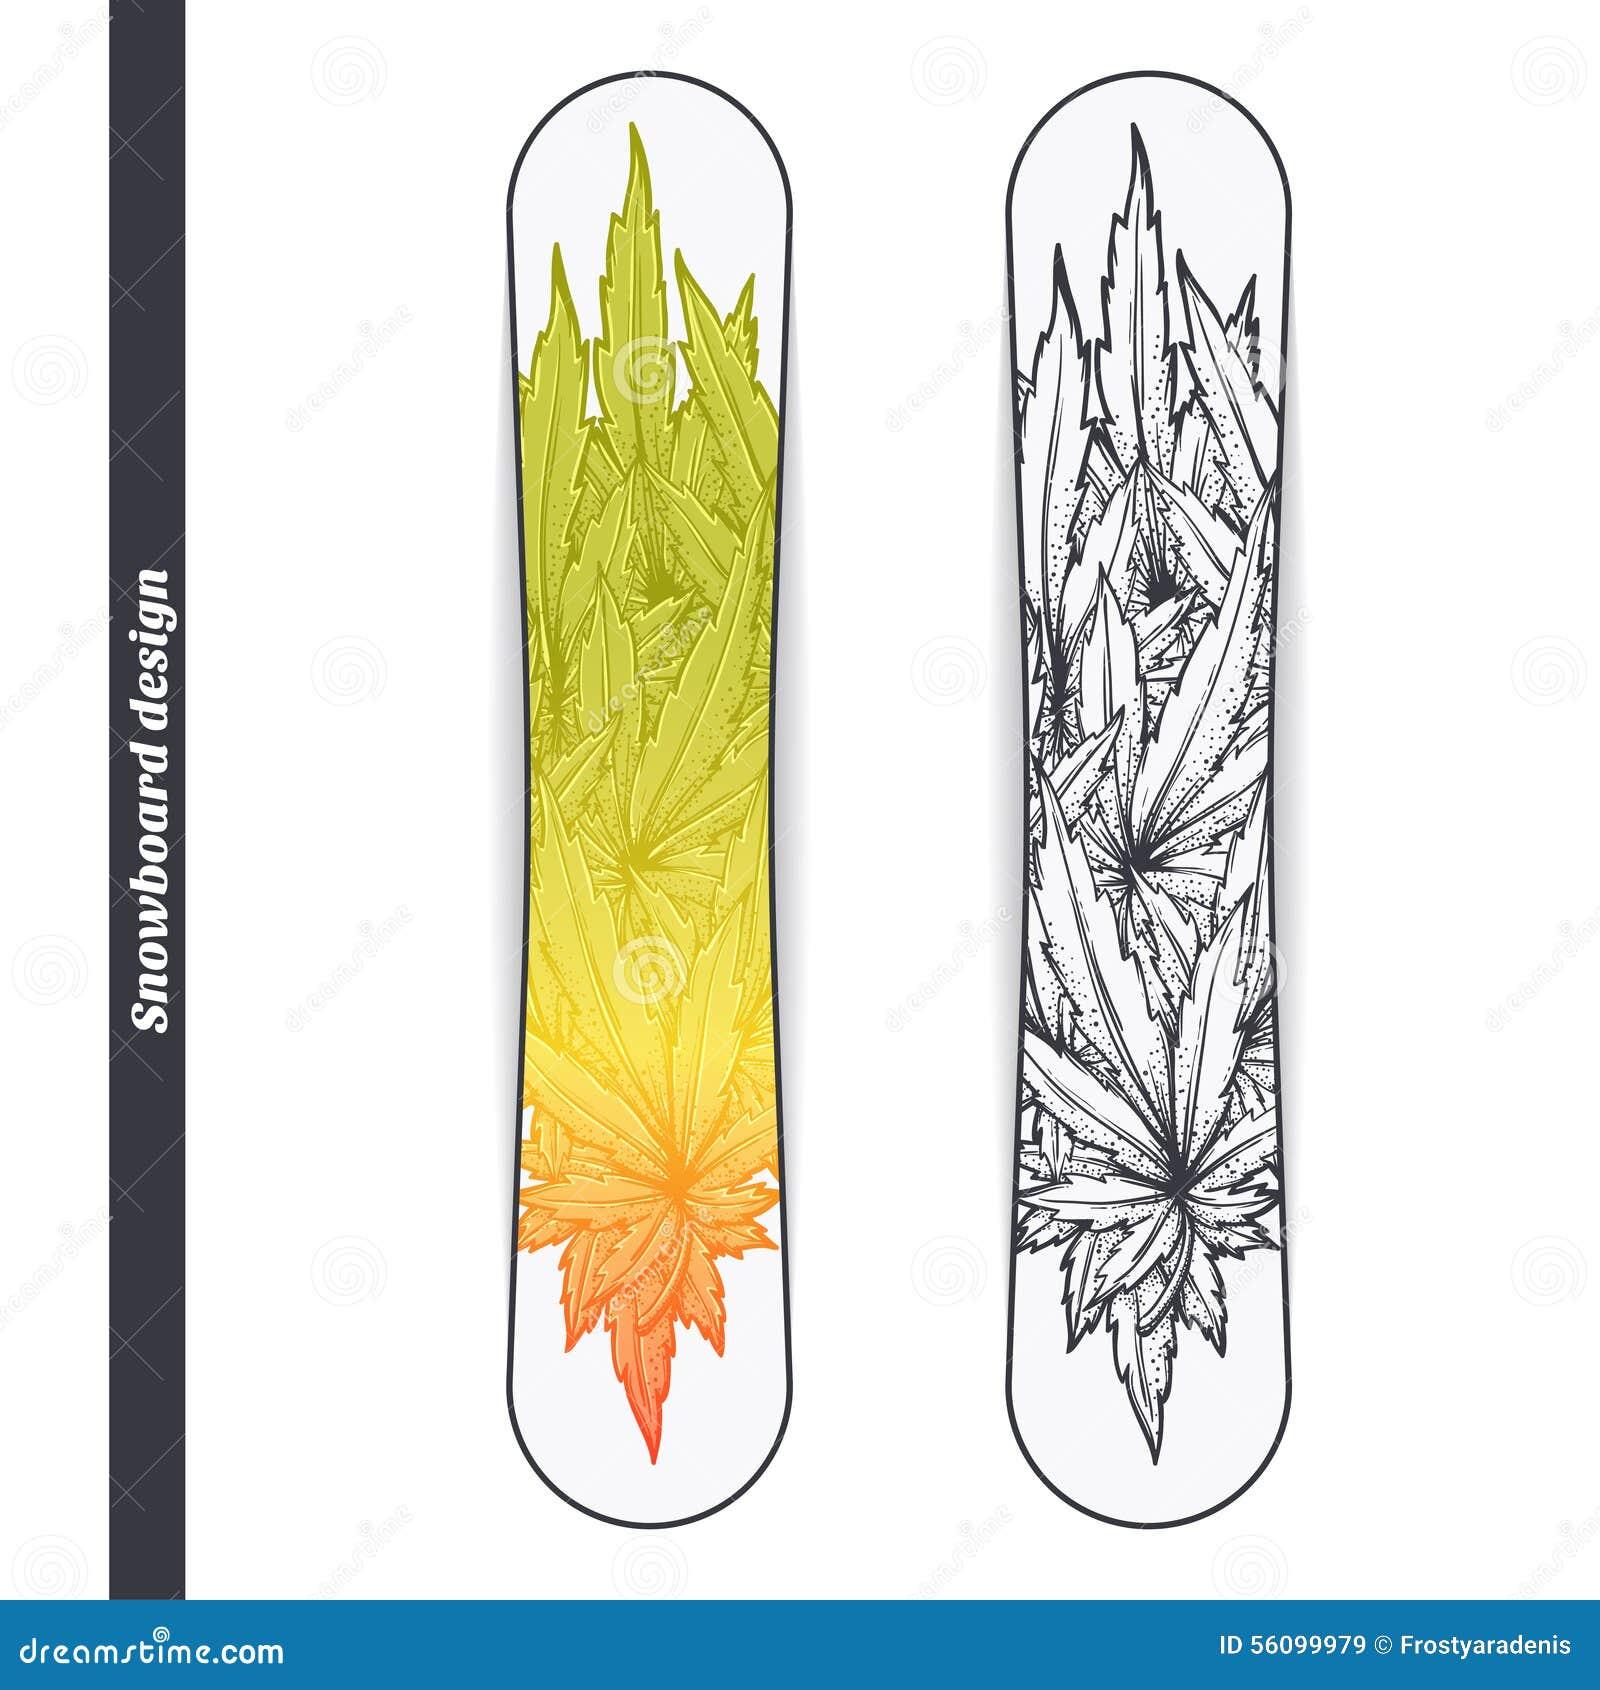 Snowboard Design Two